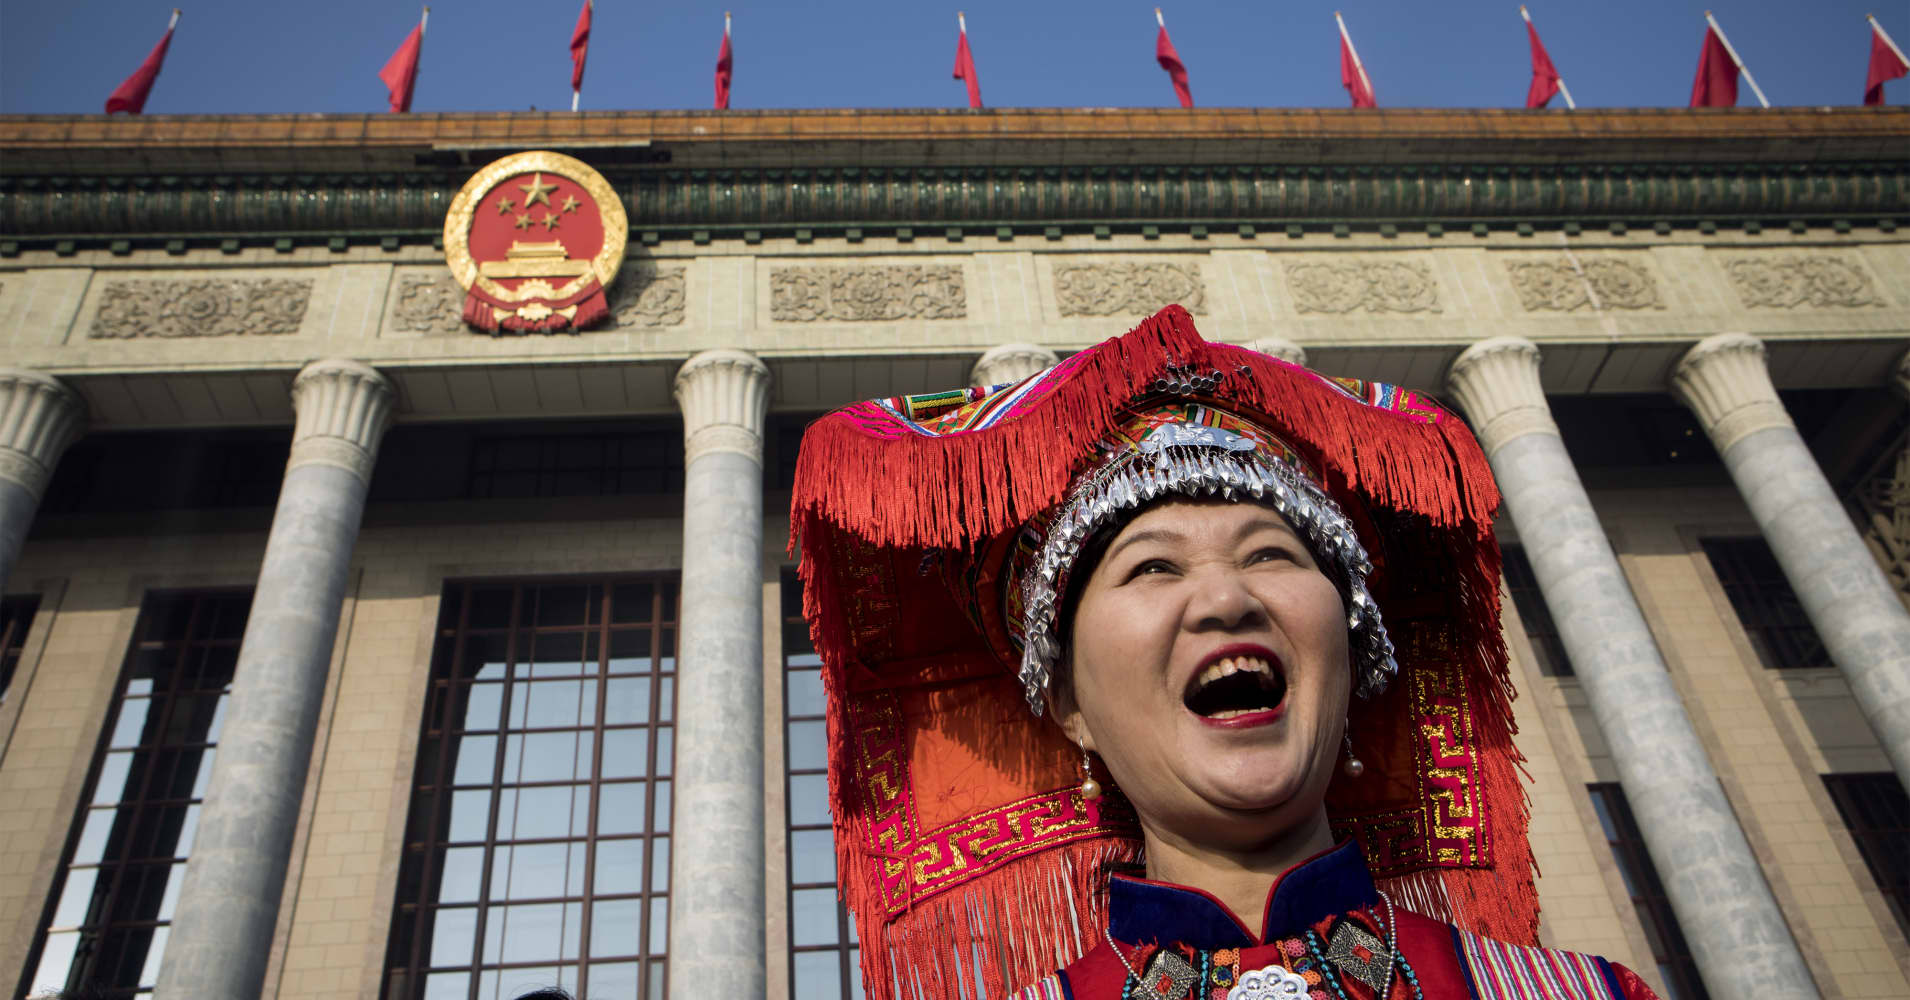 JP Morgan says China's slowing growth is 'entirely natural'